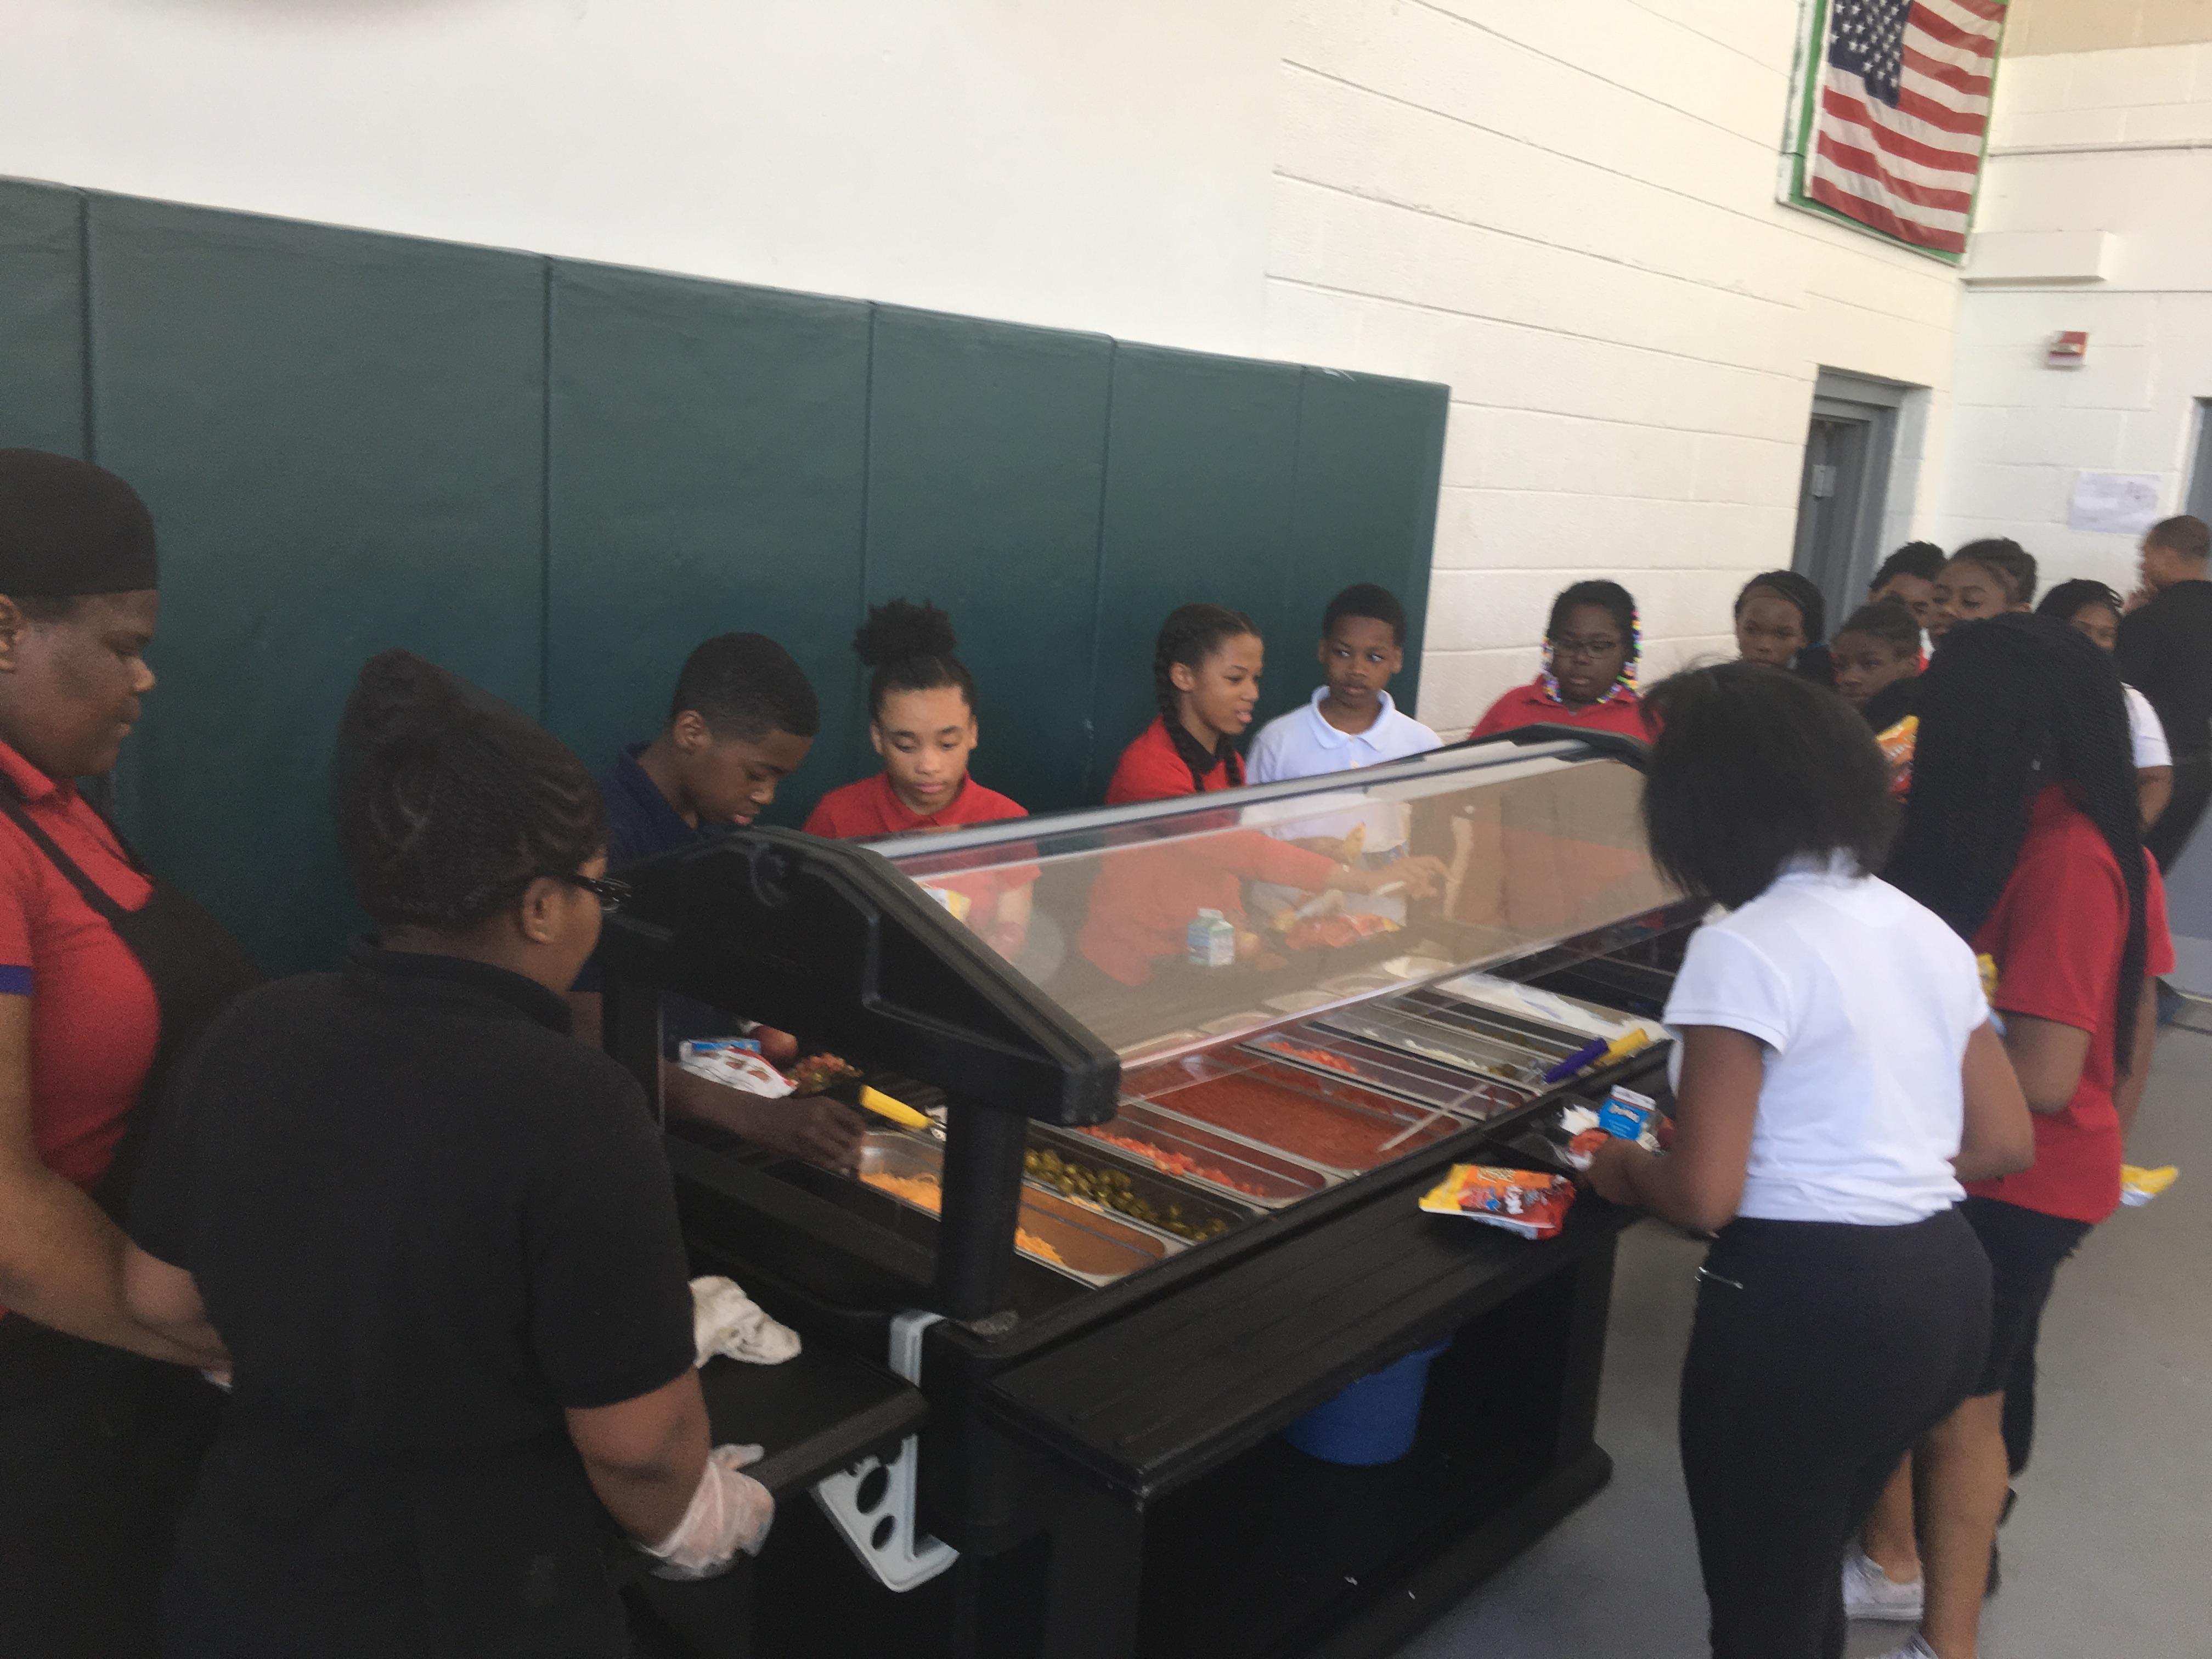 School Lunch Company